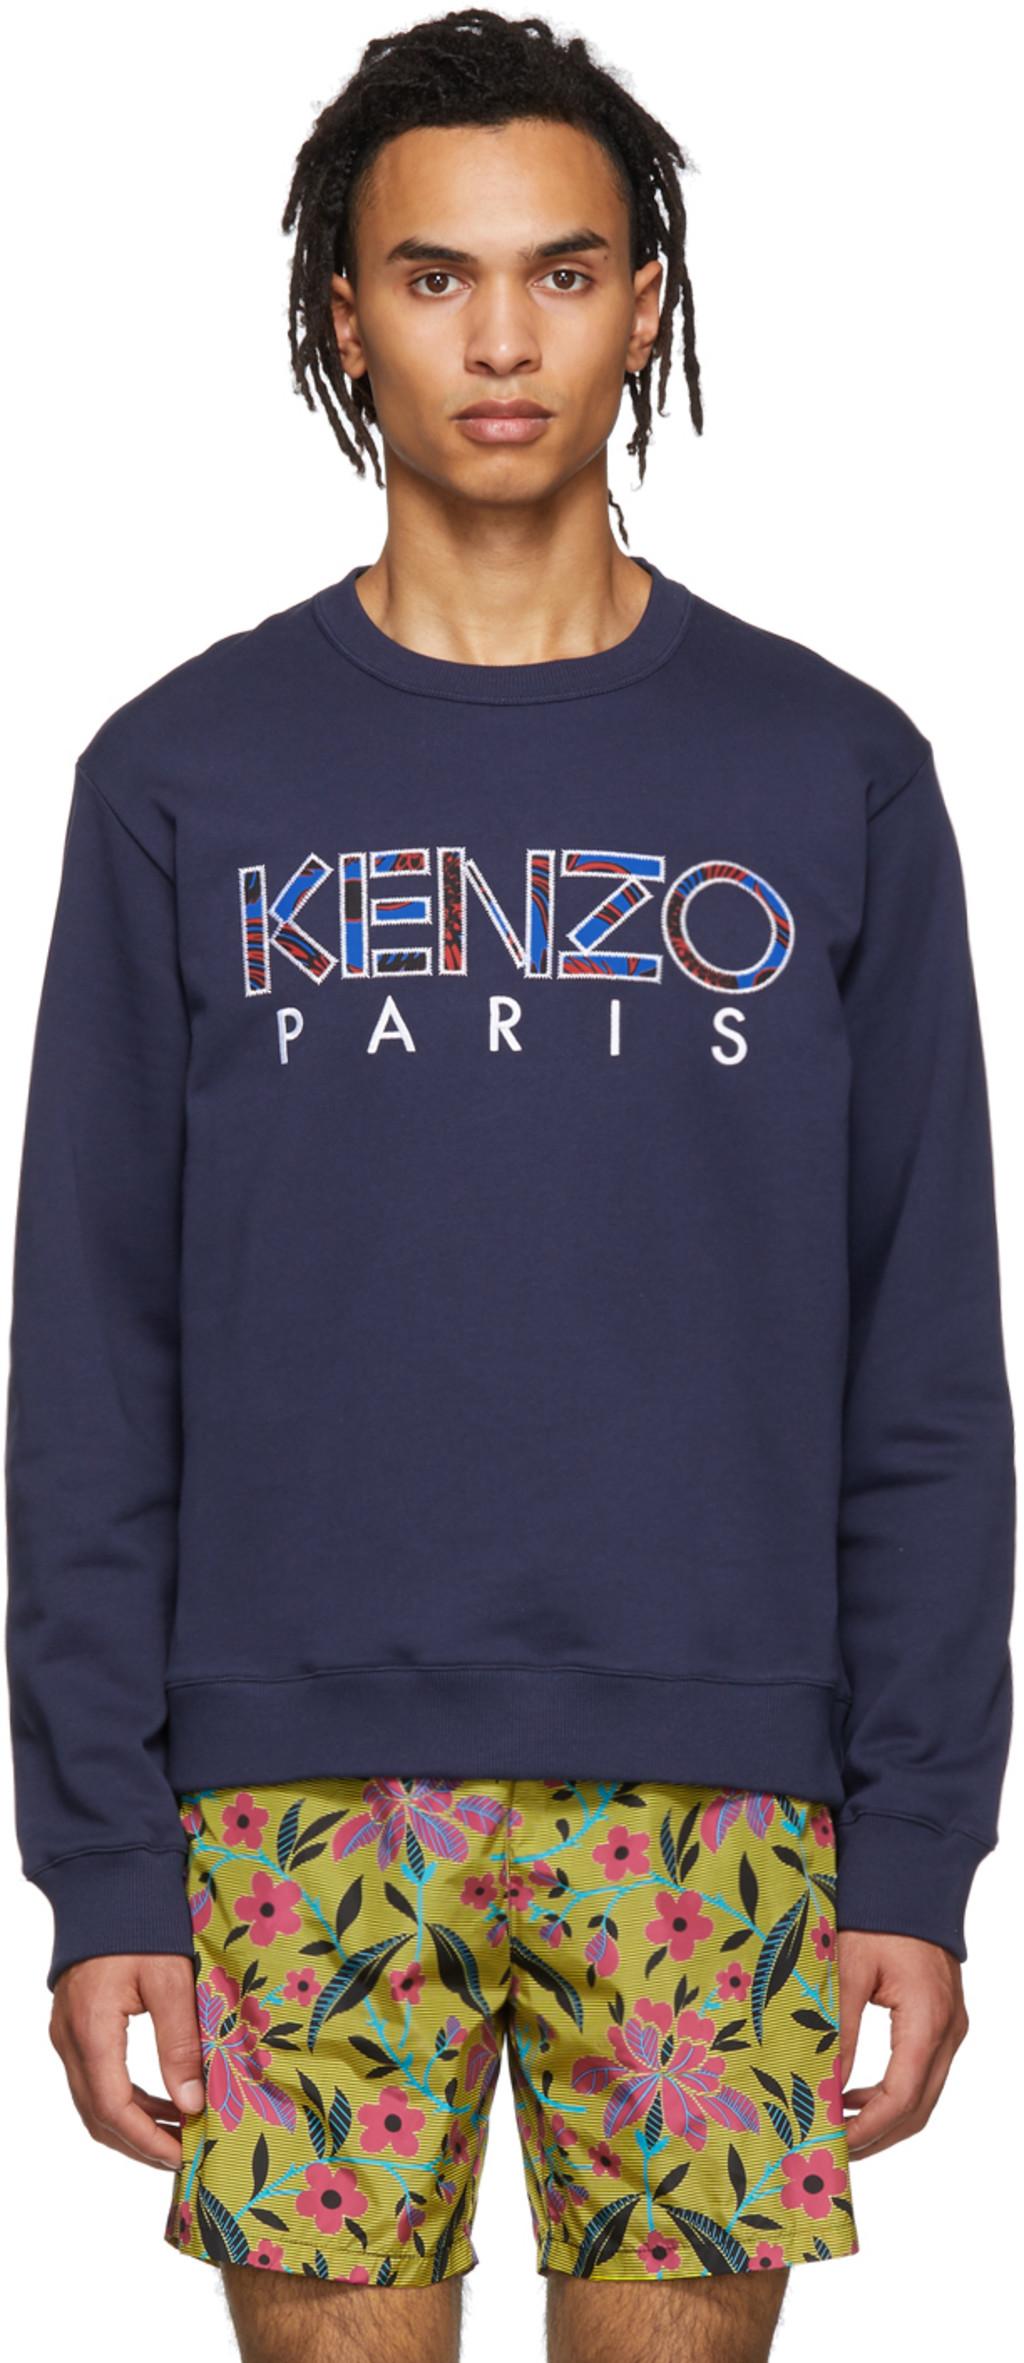 Kenzo clothing for Men   SSENSE 560d1e2cc49